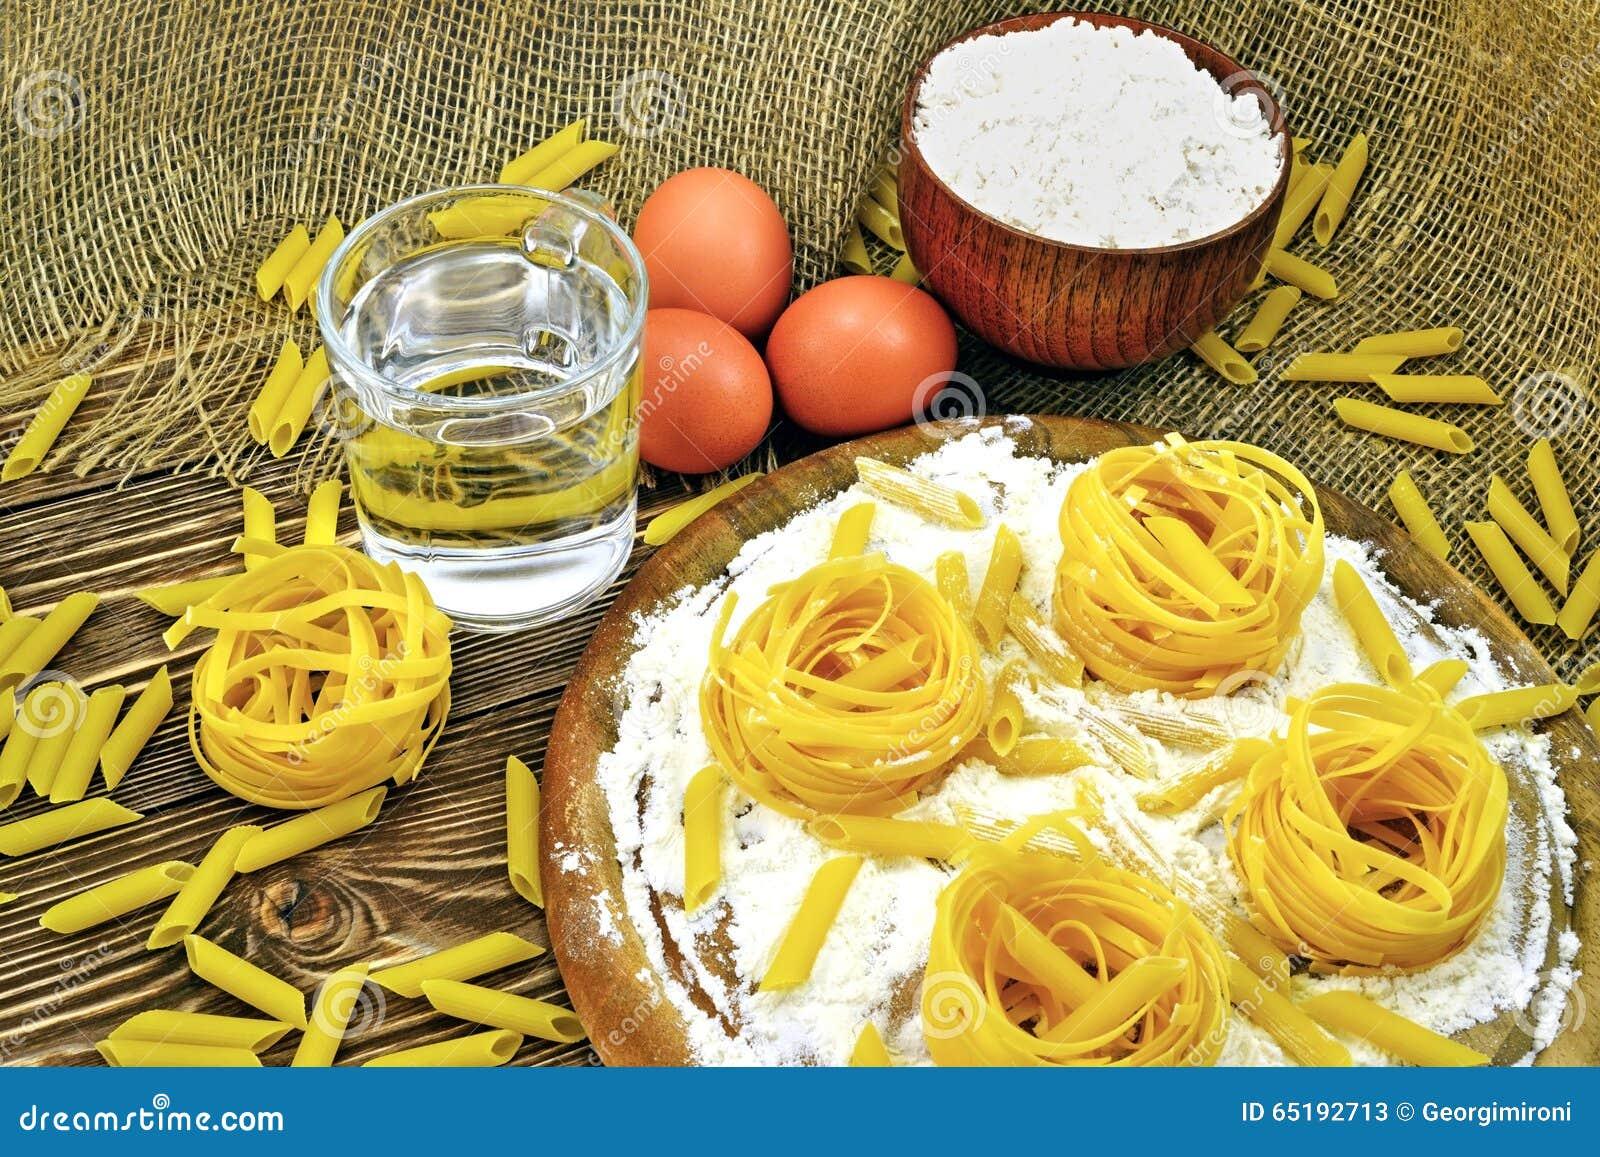 Pâtes et farine